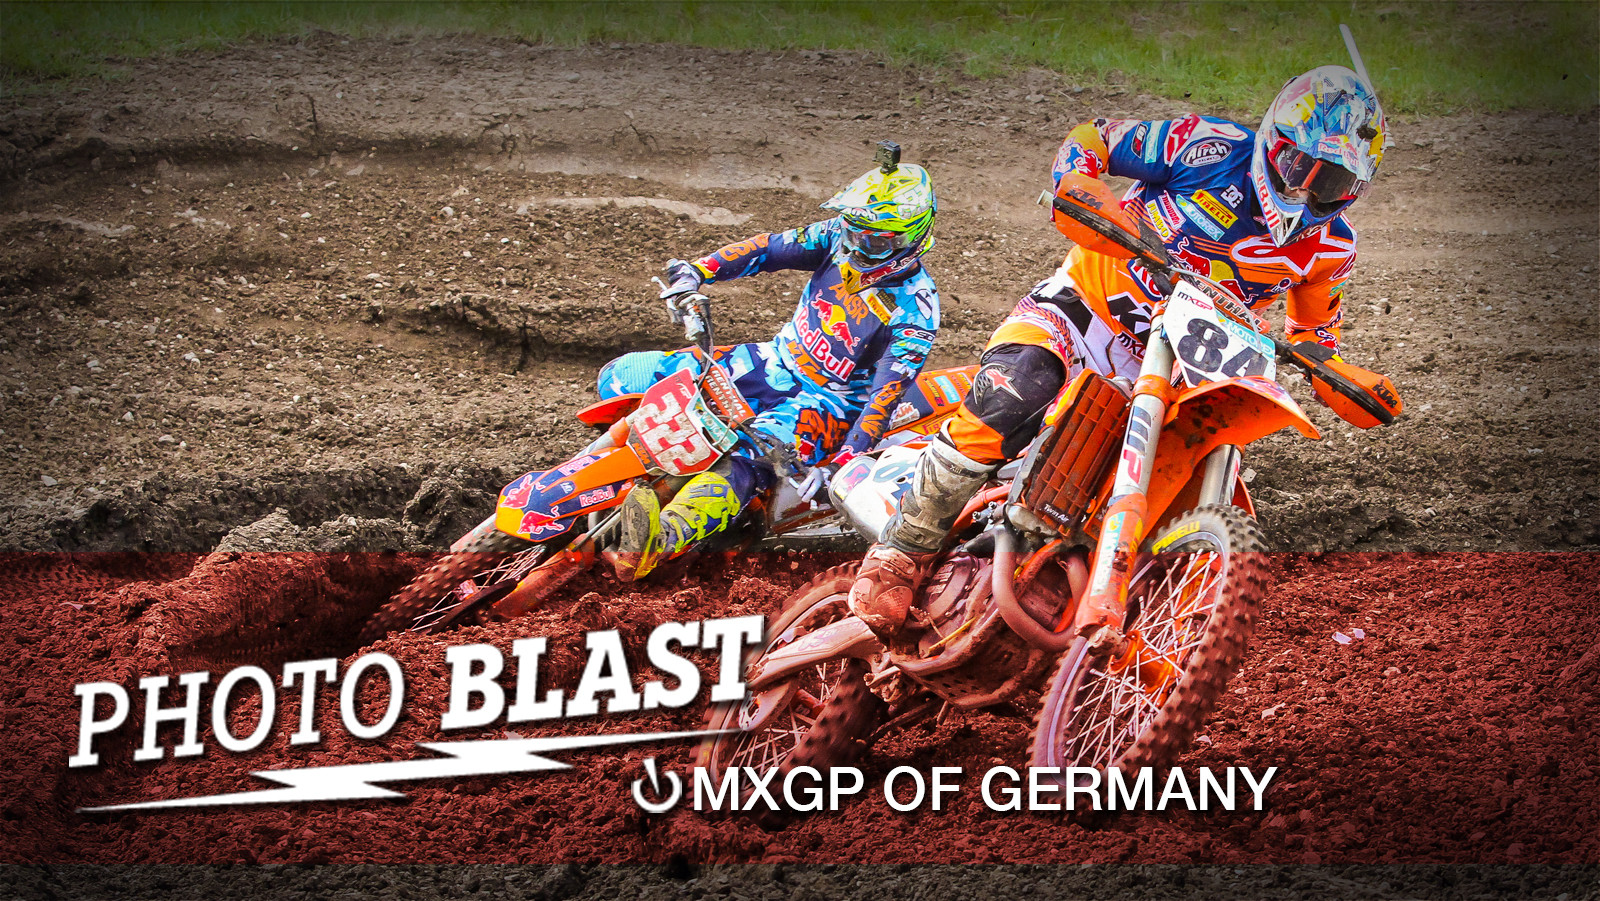 Photo Blast: 2017 MXGP of Germany - Jeffrey Herlings and Antonio Cairoli - Photo Blast: 2017 MXGP of Germany - Motocross Pictures - Vital MX